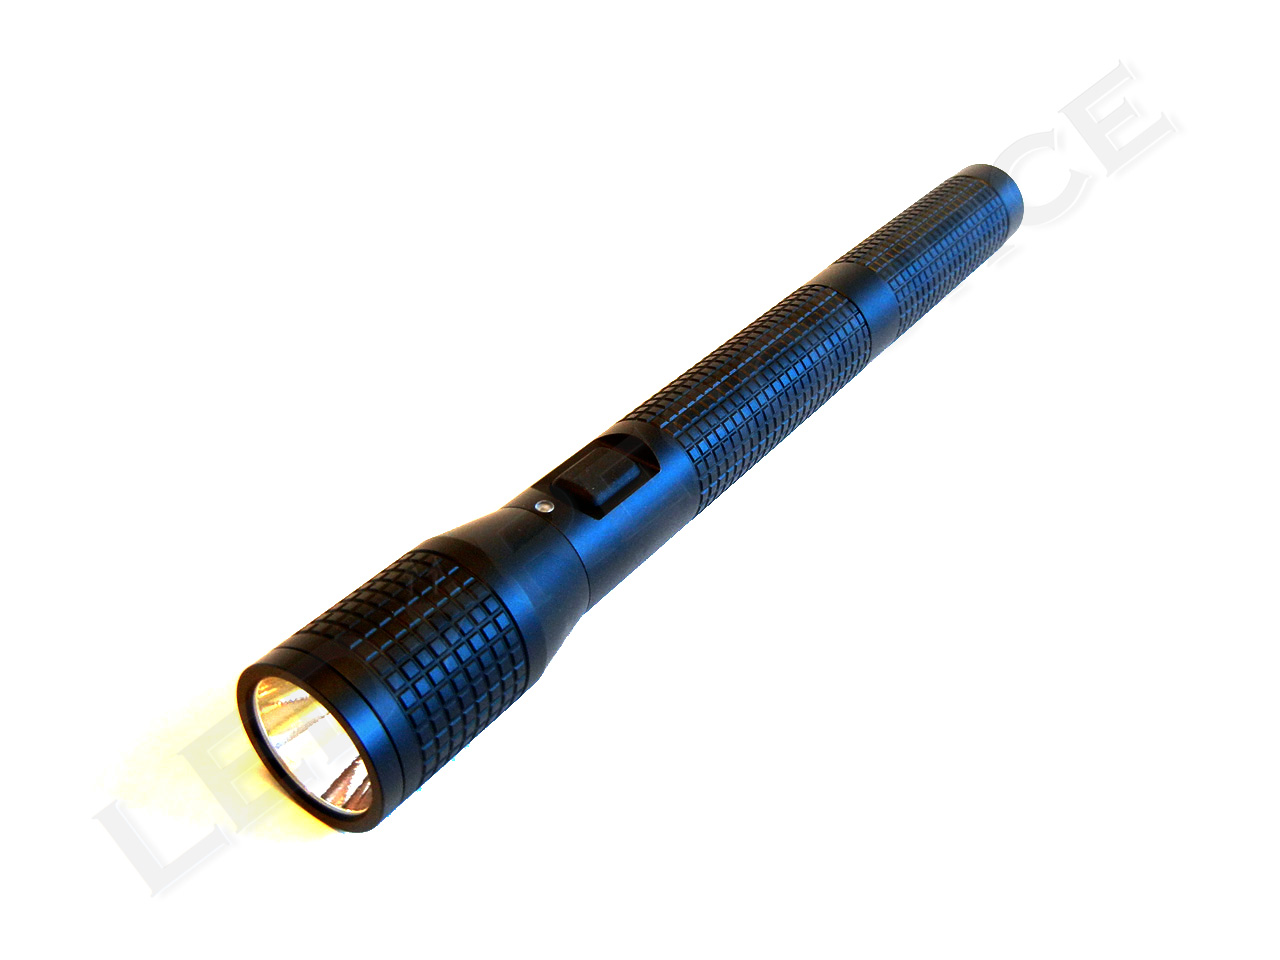 Traffic flashlights